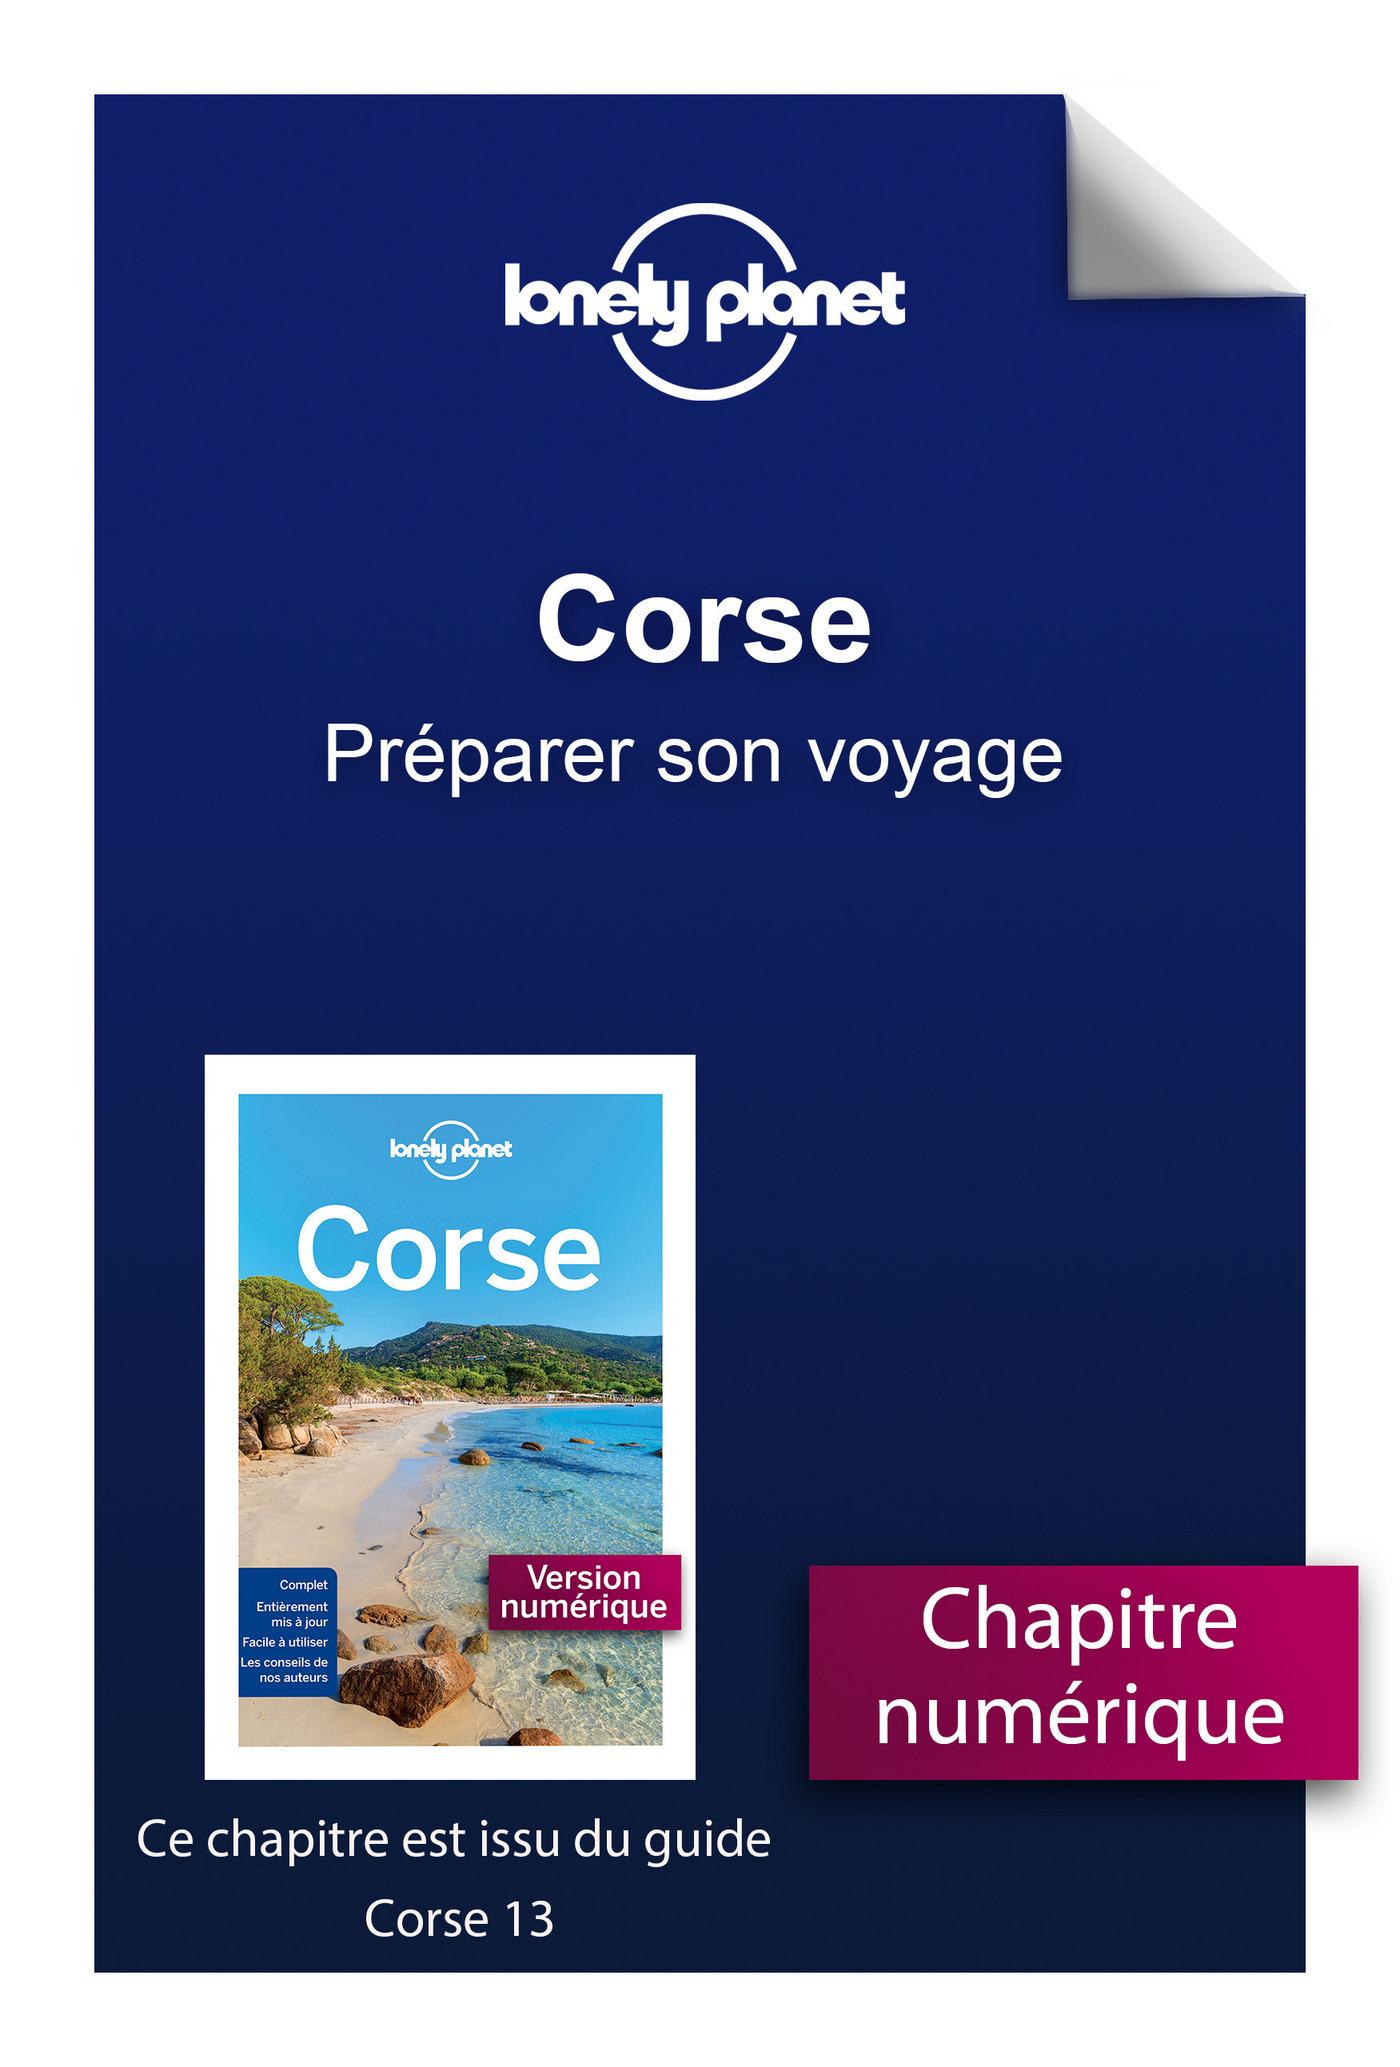 Corse - Préparer son voyage